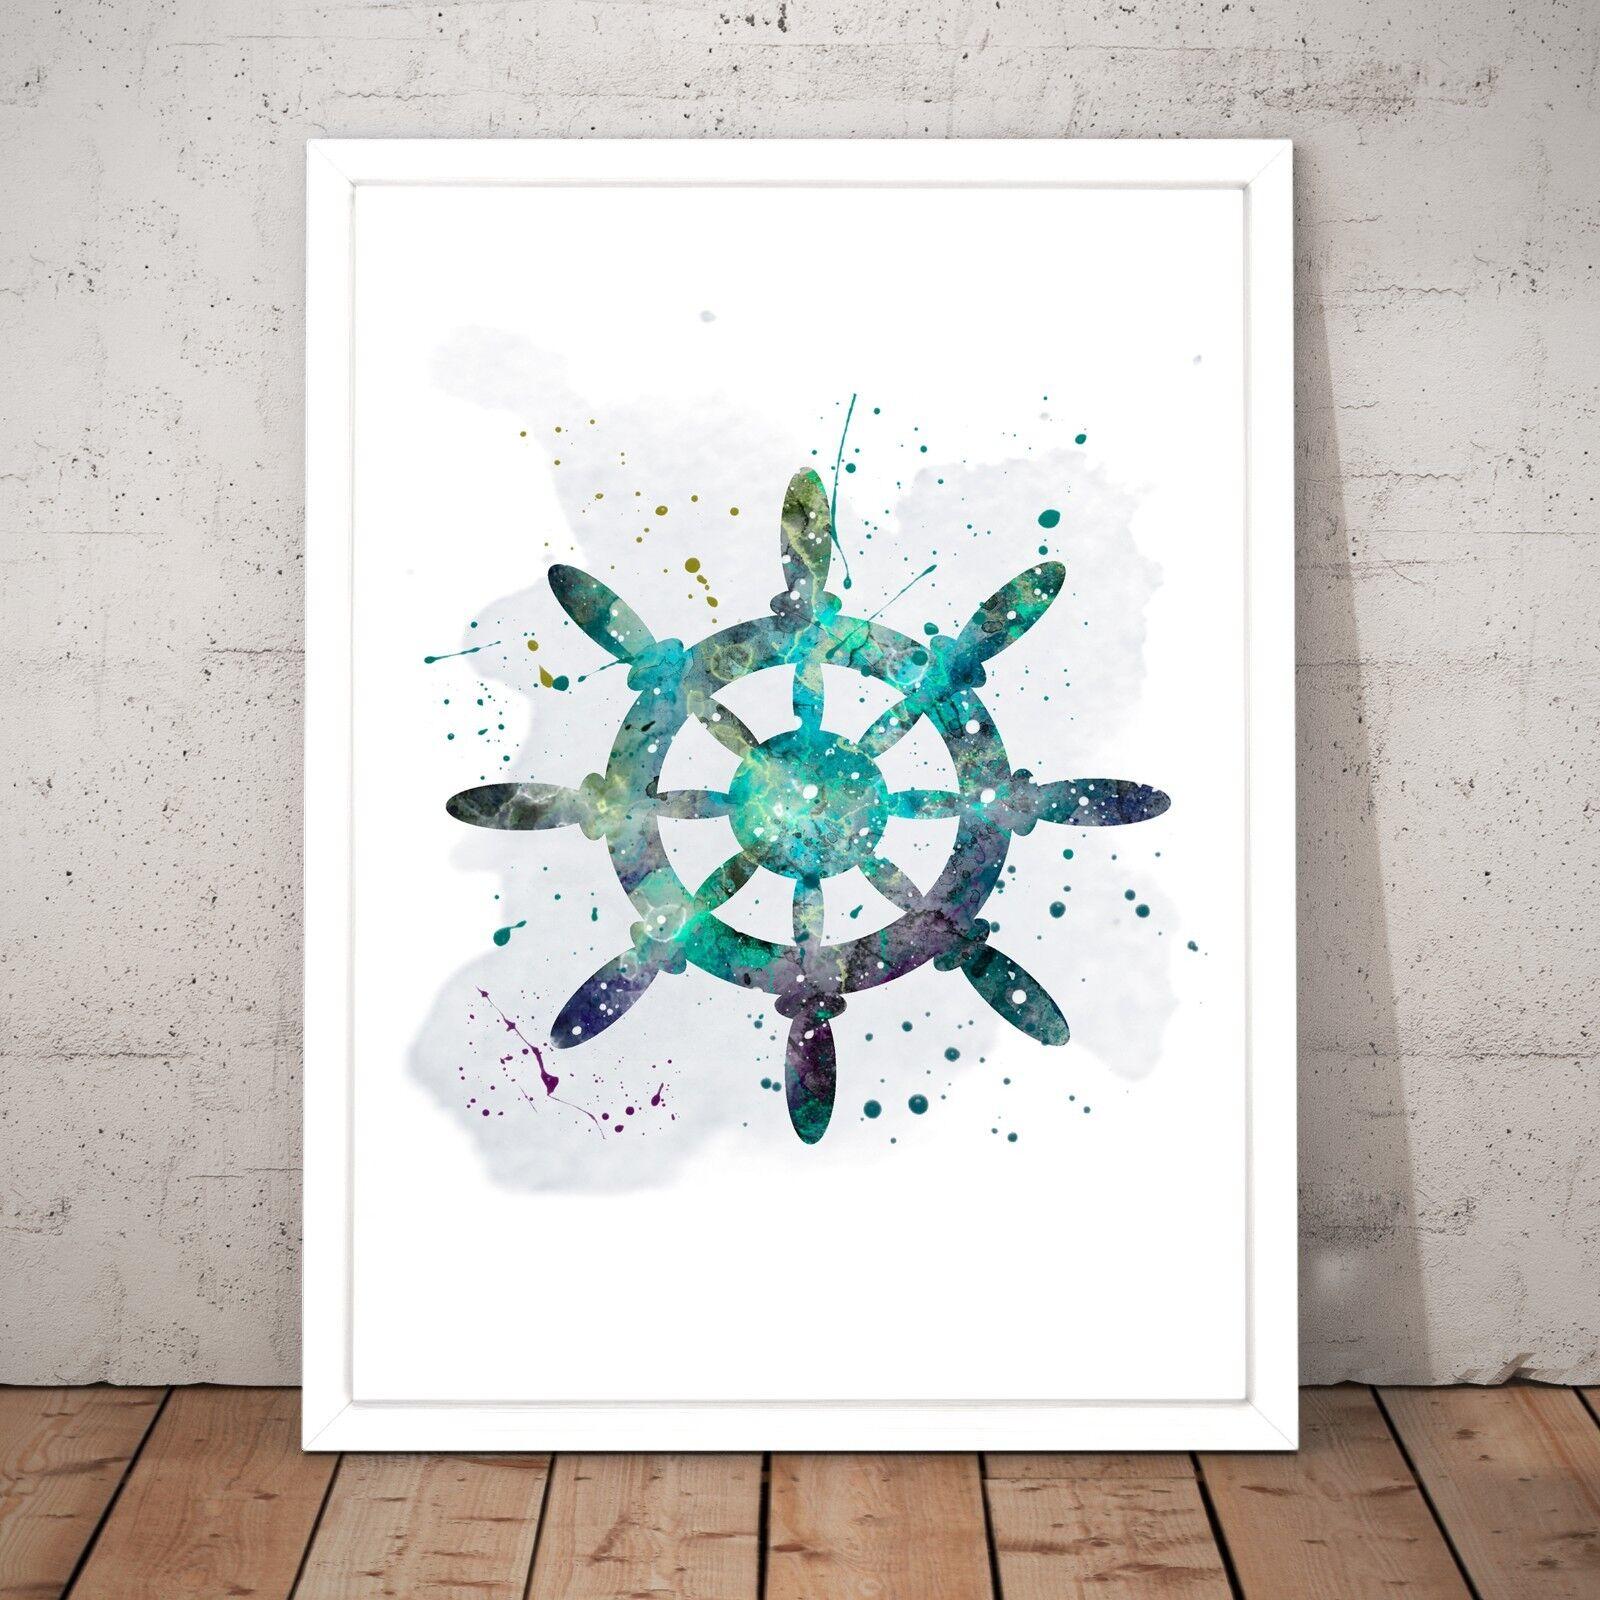 Boat Wheel Nautical Sailing Ship Unique Art Poster Print - A3 A2 A1 A0 Framed